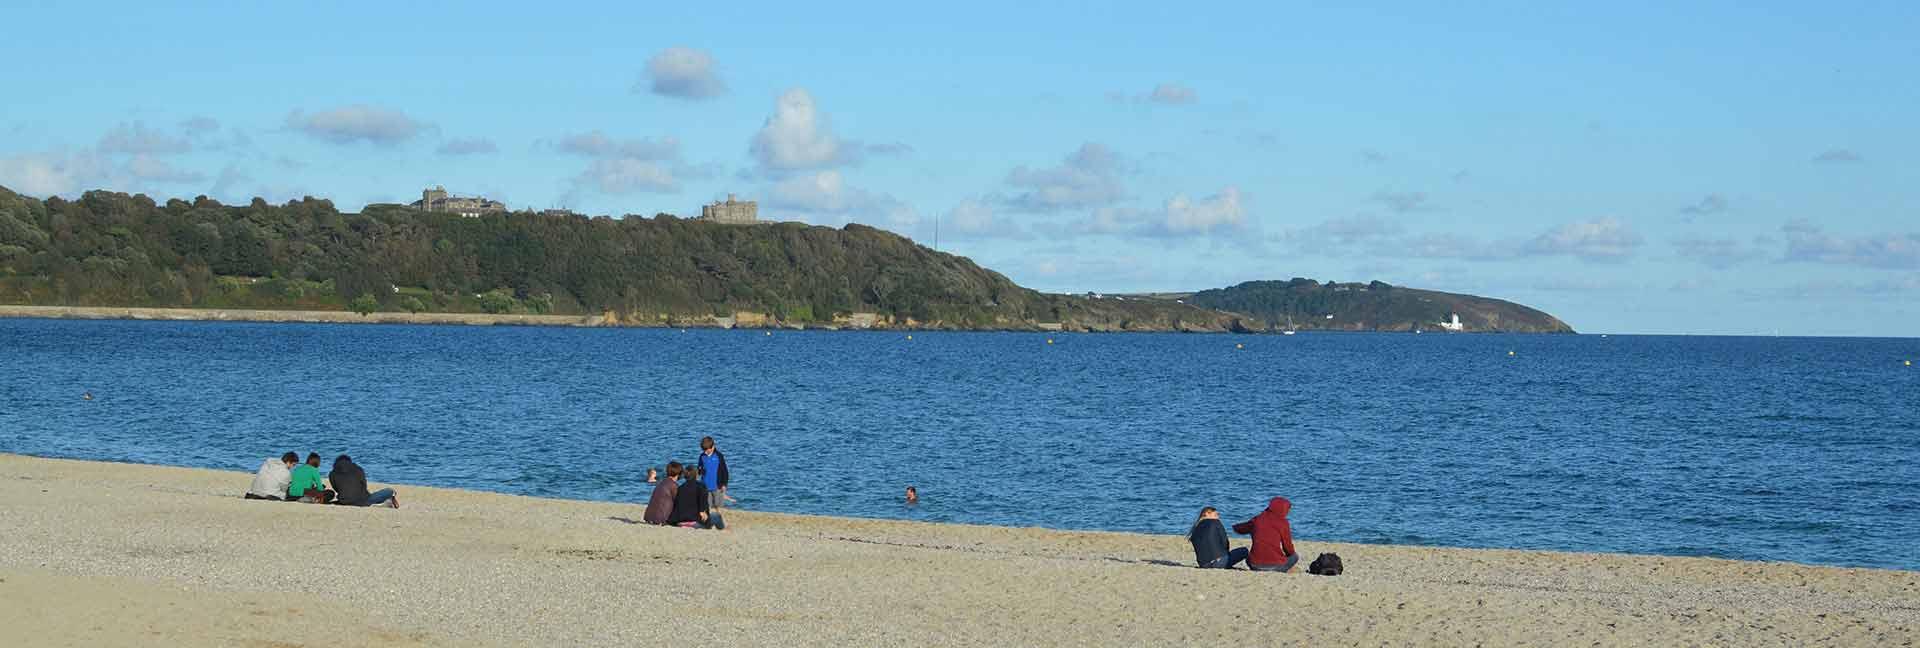 Gyllyngvase beach in Falmouth, Cornwall